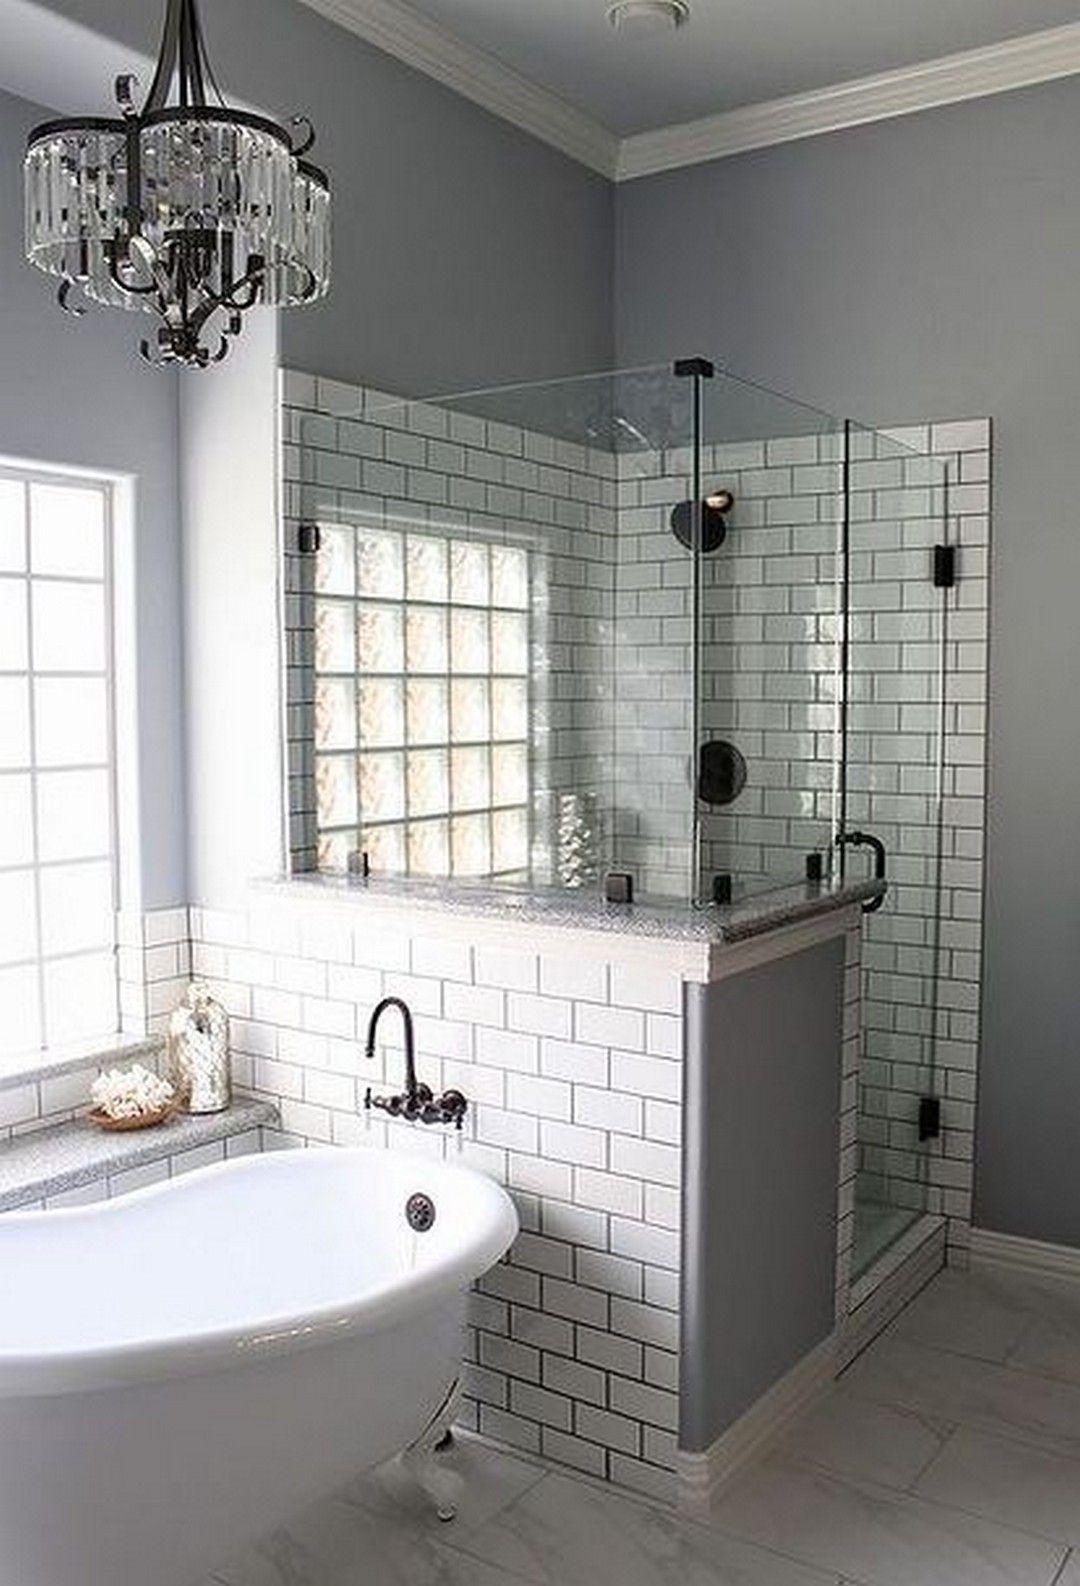 How Much Budget Bathroom Remodel You Need? | Urban farmhouse ...